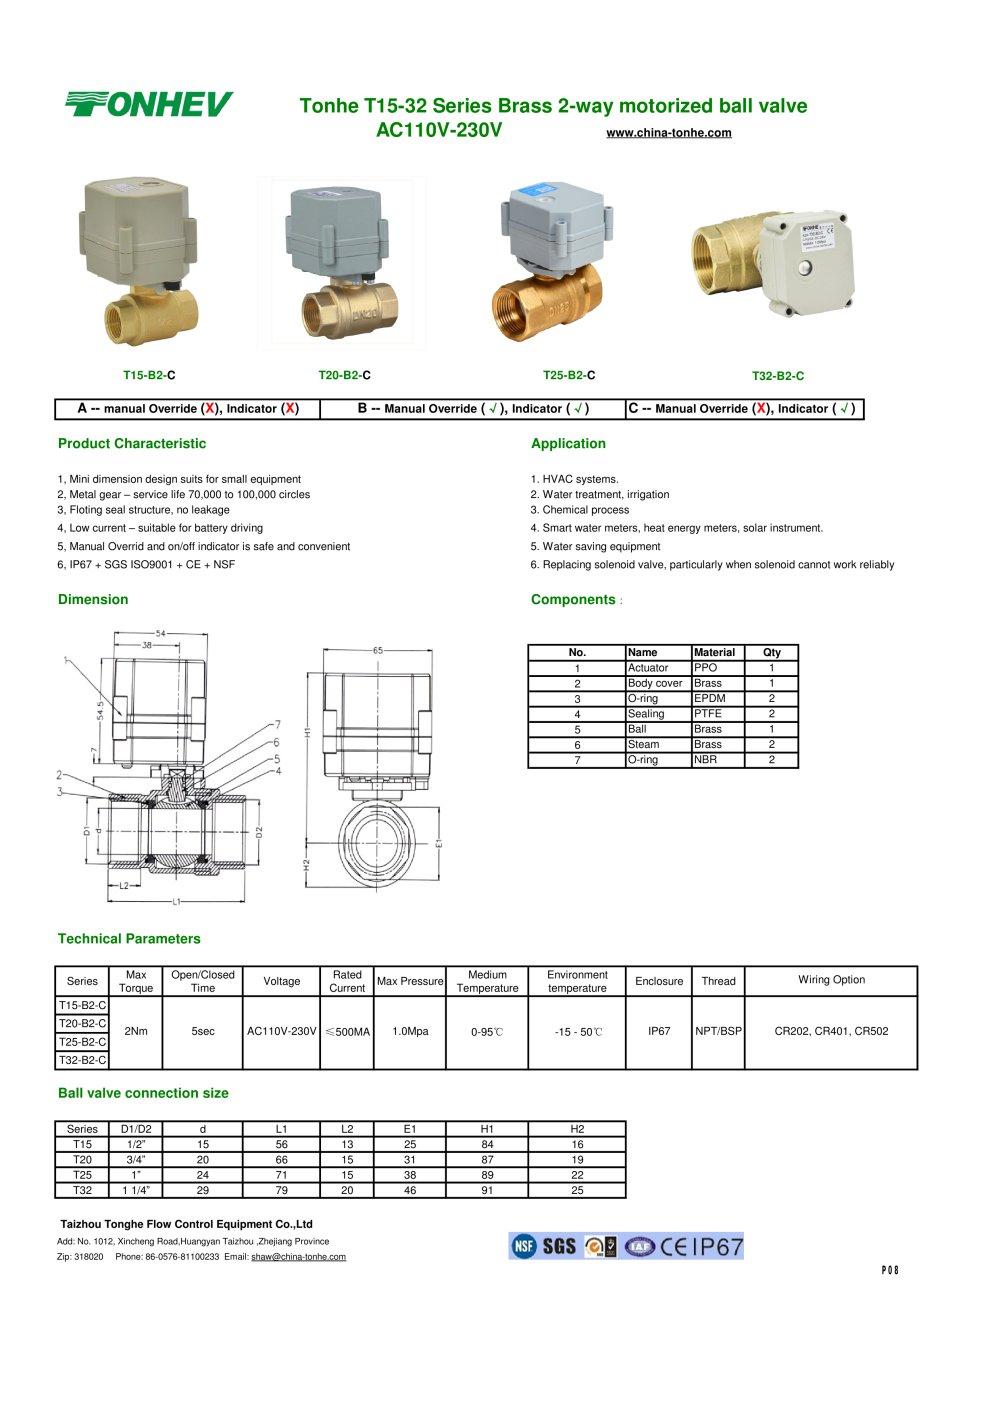 Tonhe T15 32 Series Brass 2 Way Motorized Ball Valve Ac110v 230v Seriesactuatorsolenoiddrive Controlcircuit Circuit Diagram 1 Pages